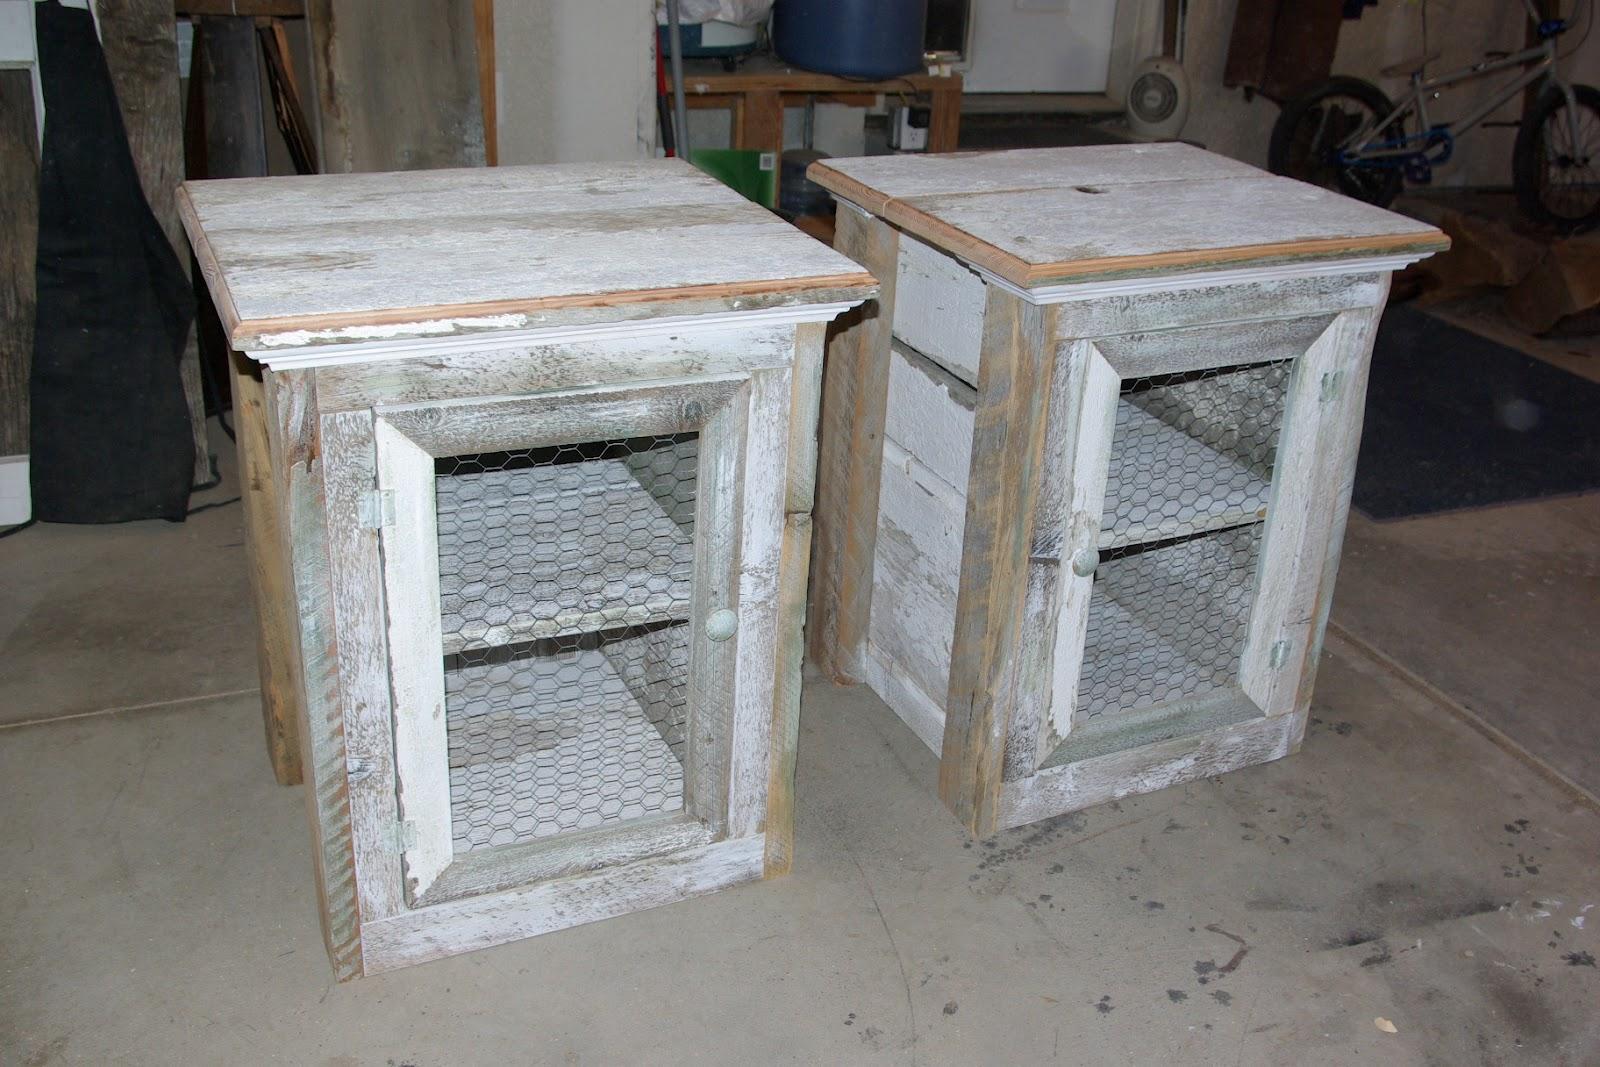 Reclaimed rustics rustic nightstands for Tall rustic nightstands